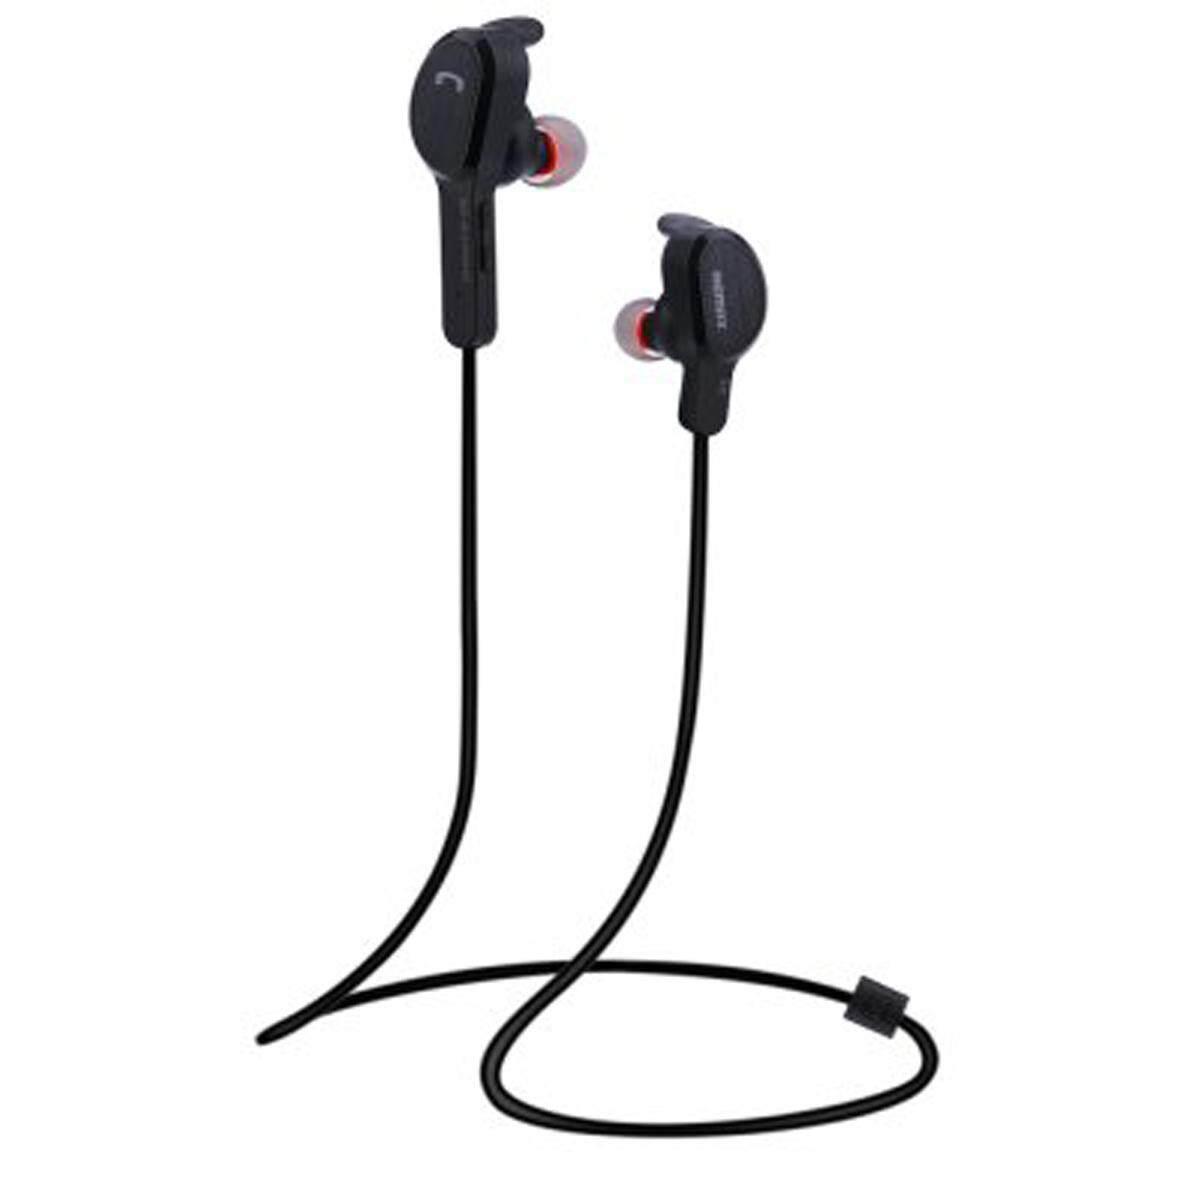 Remax S5 Bluetooth V4.1 Magnetic Stereo Sport Earphones Headphones